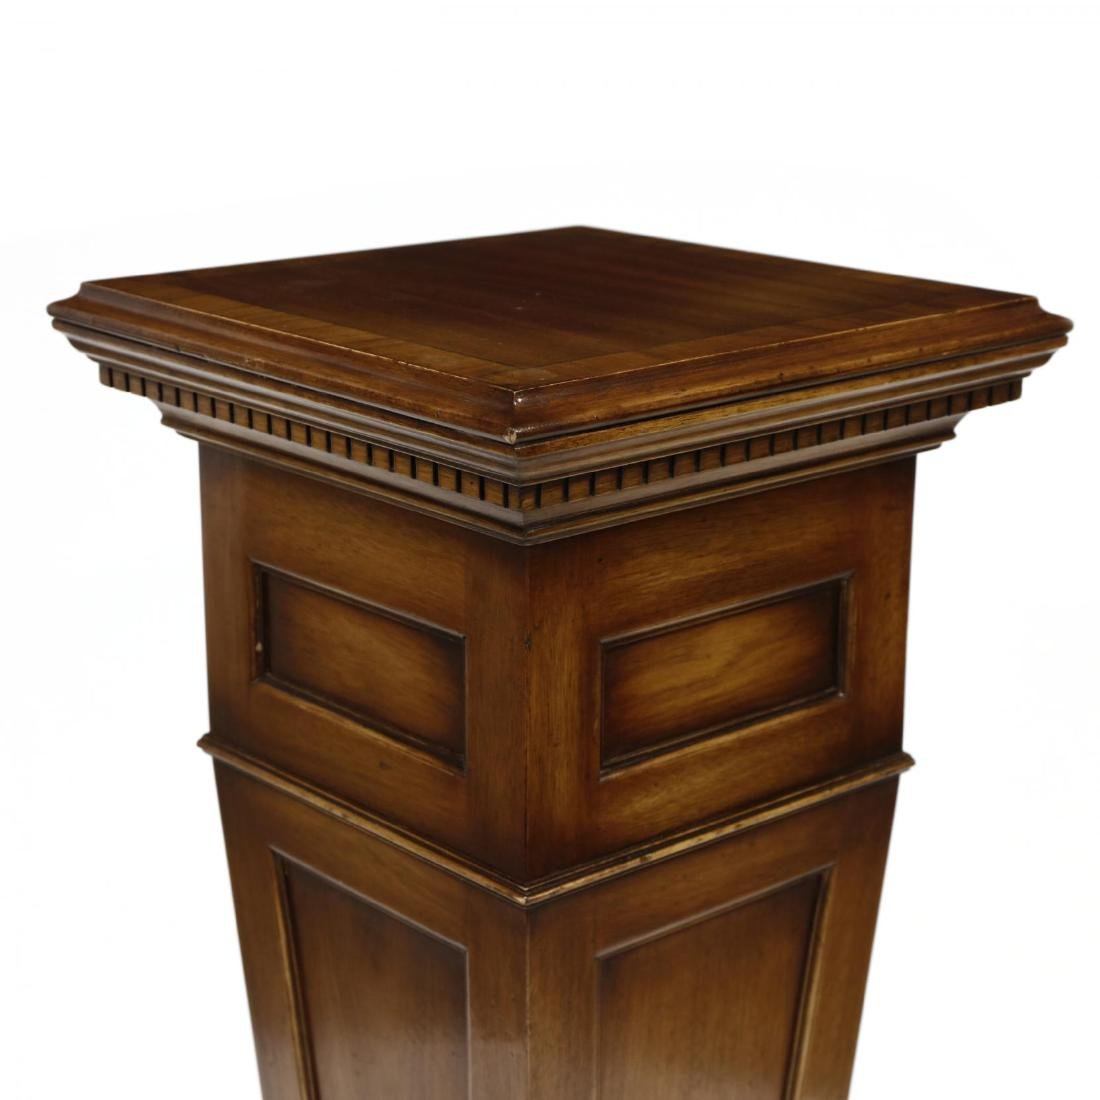 Georgian Style Mahogany Pedestal - 2